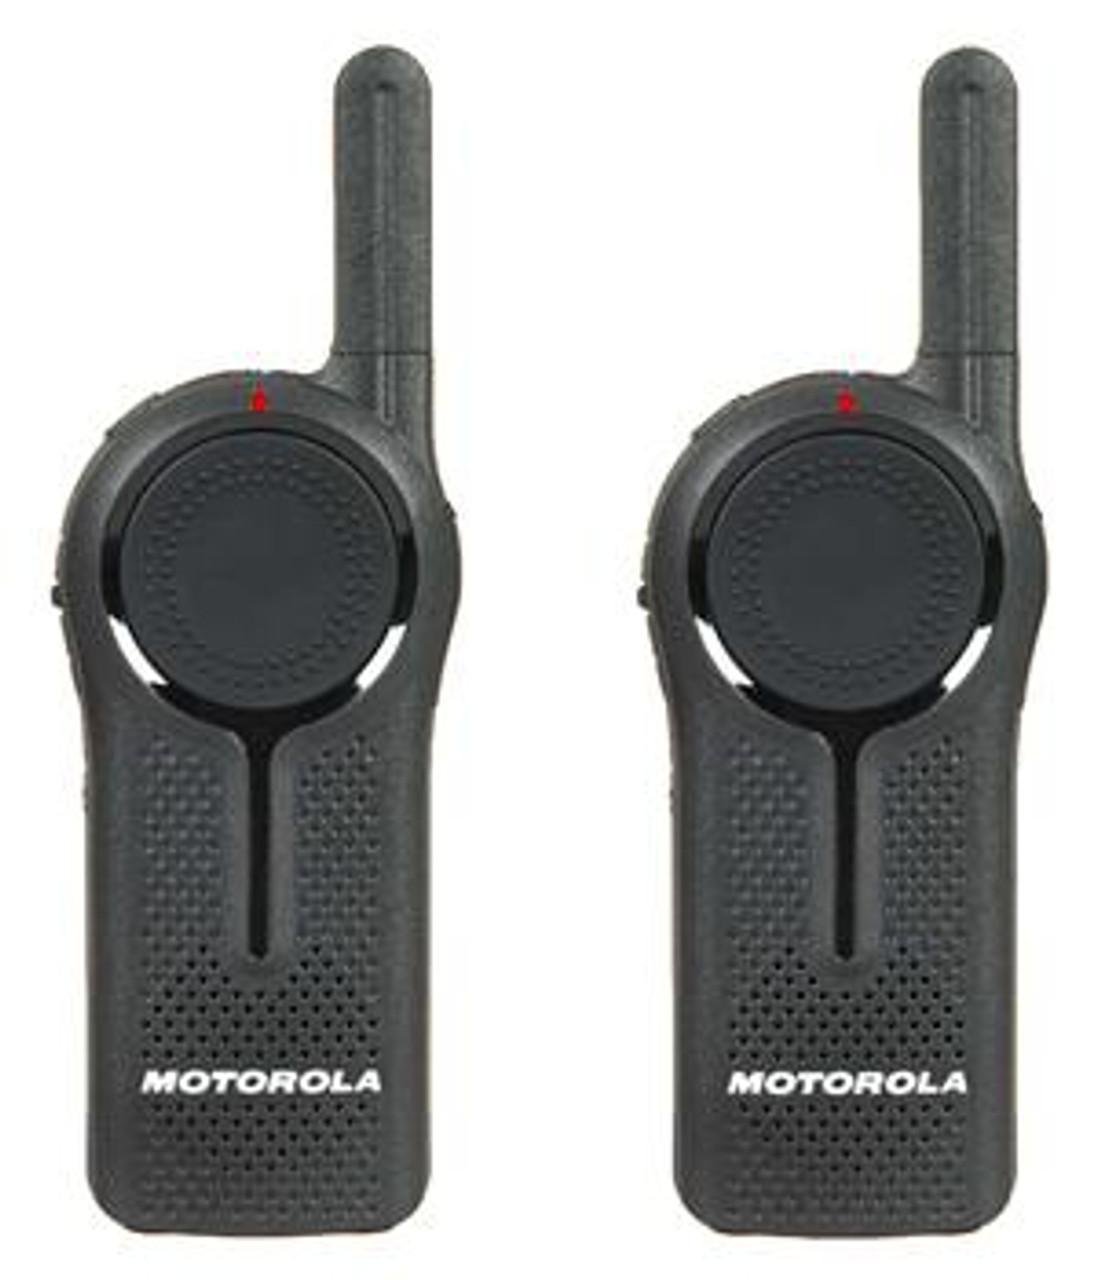 Motorola DLR Digital 2 Way Radio, Pack of 2